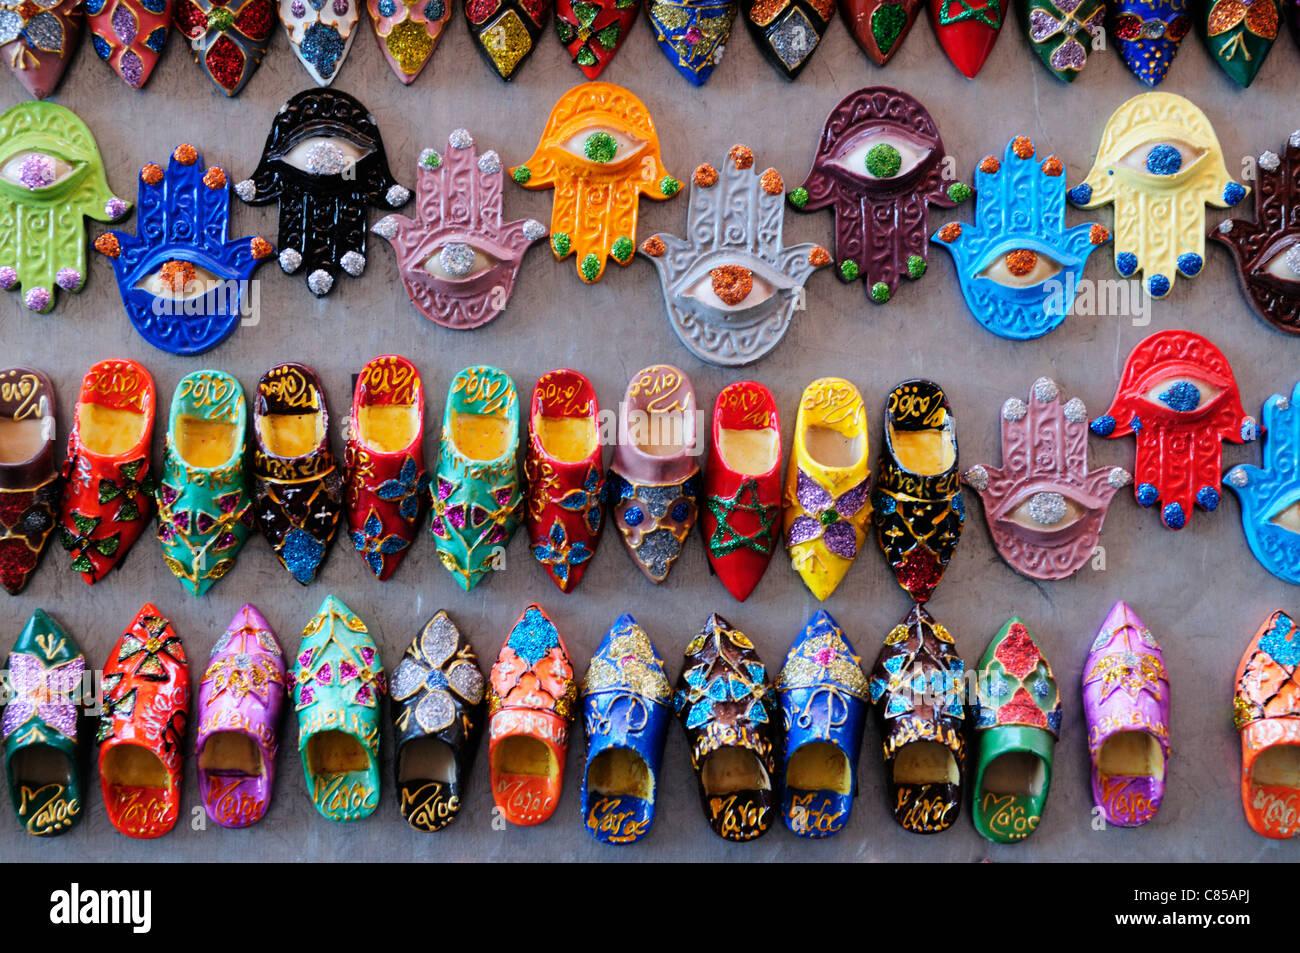 moroccan fridge magnets stock photos moroccan fridge magnets stock